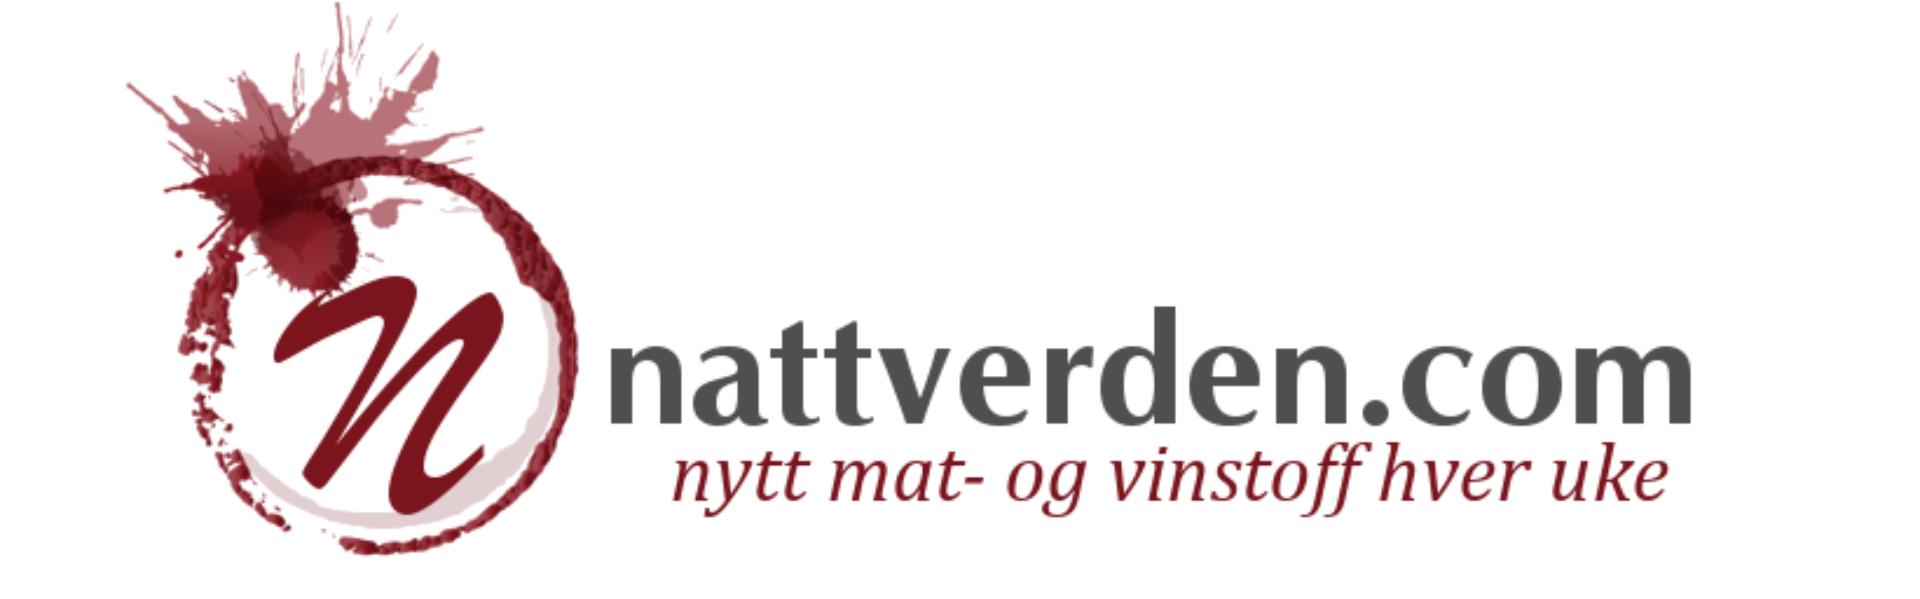 nattverden.com